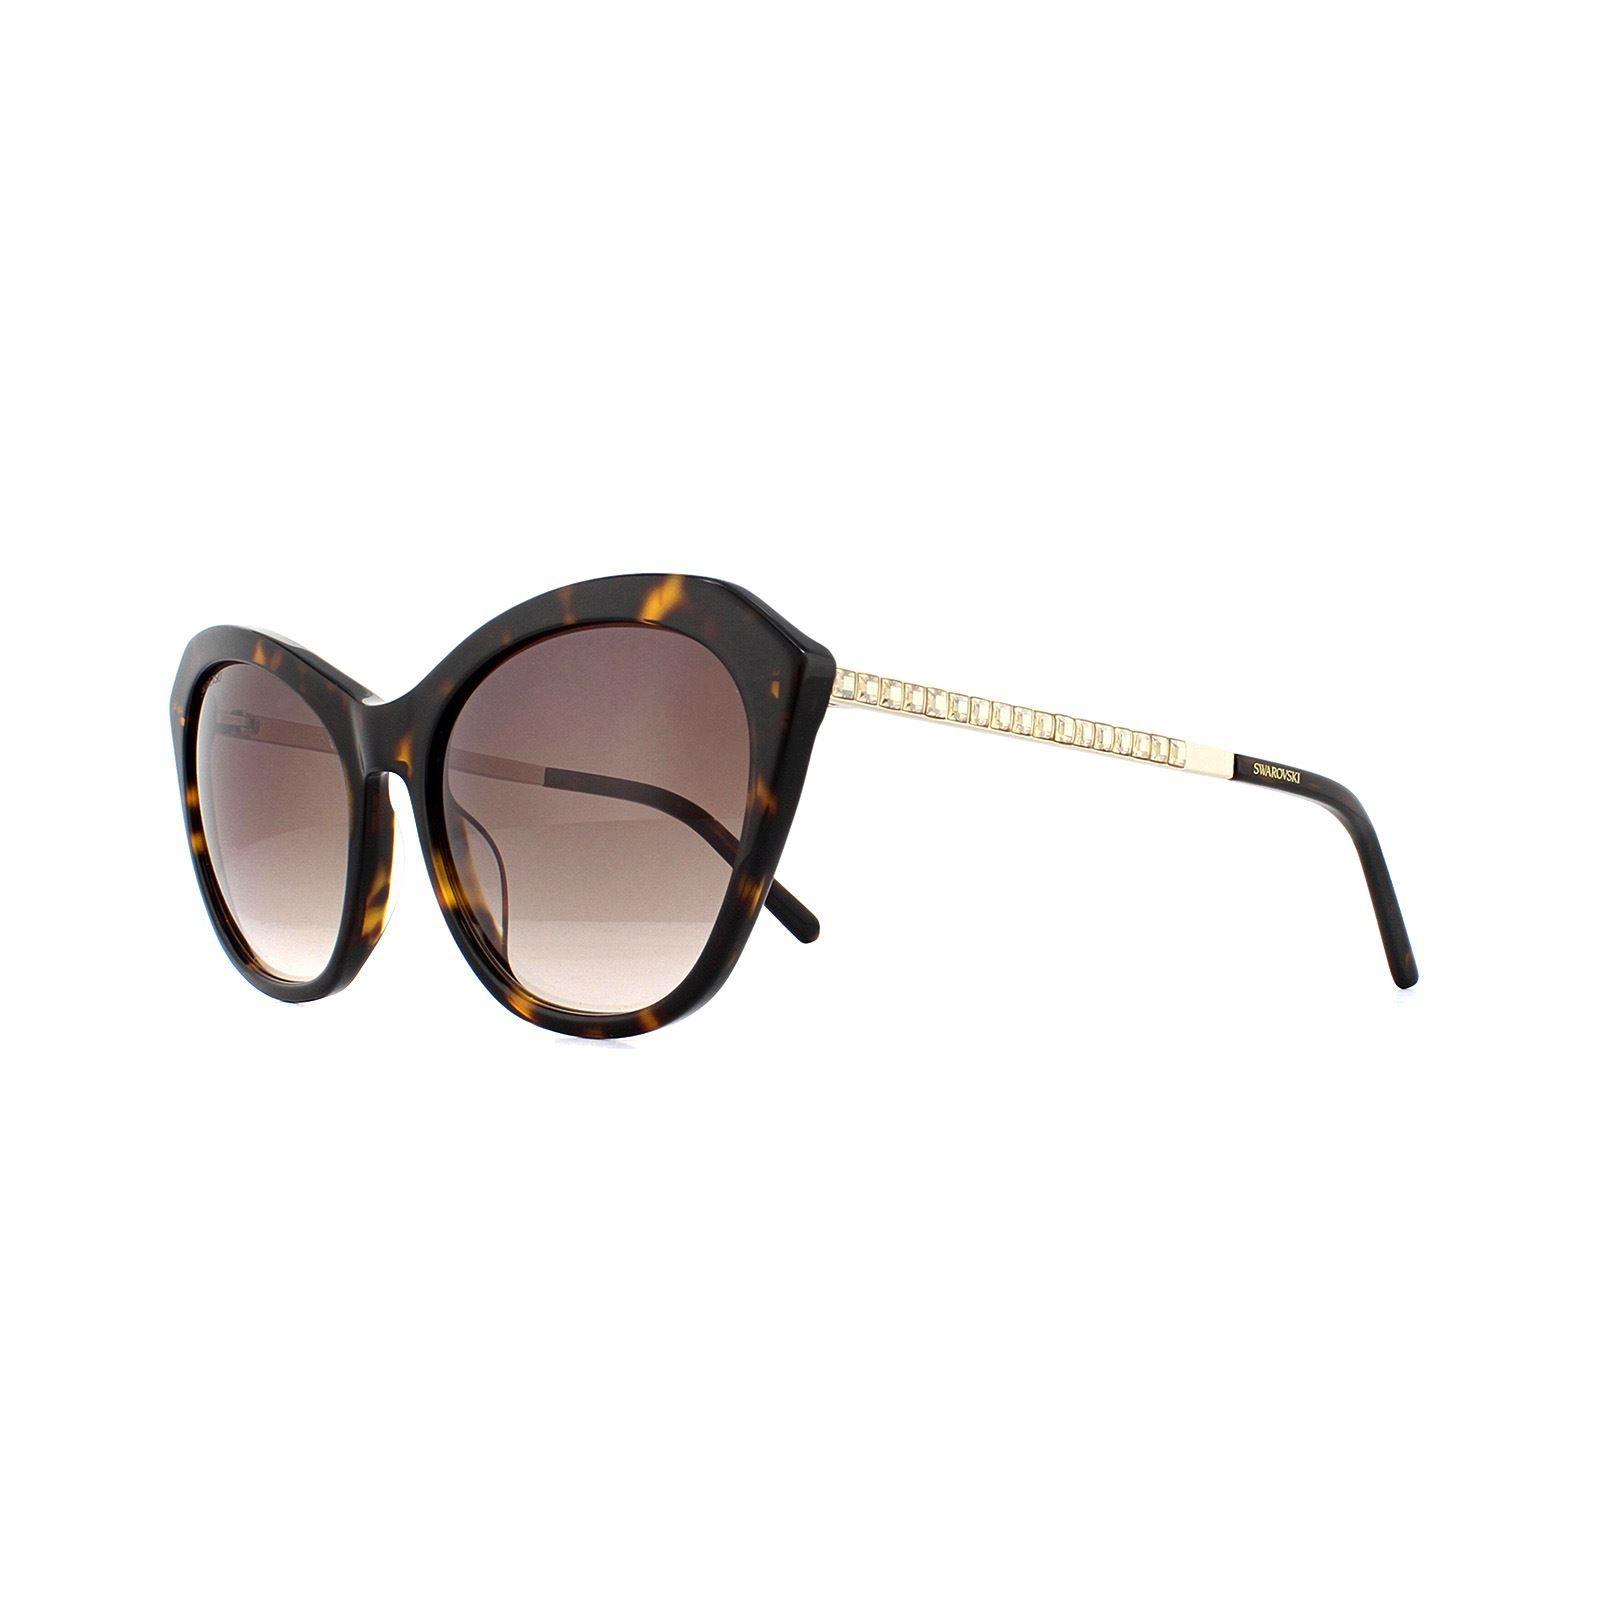 Swarovski Sunglasses SK0143 52F Dark Havana Brown Gradient